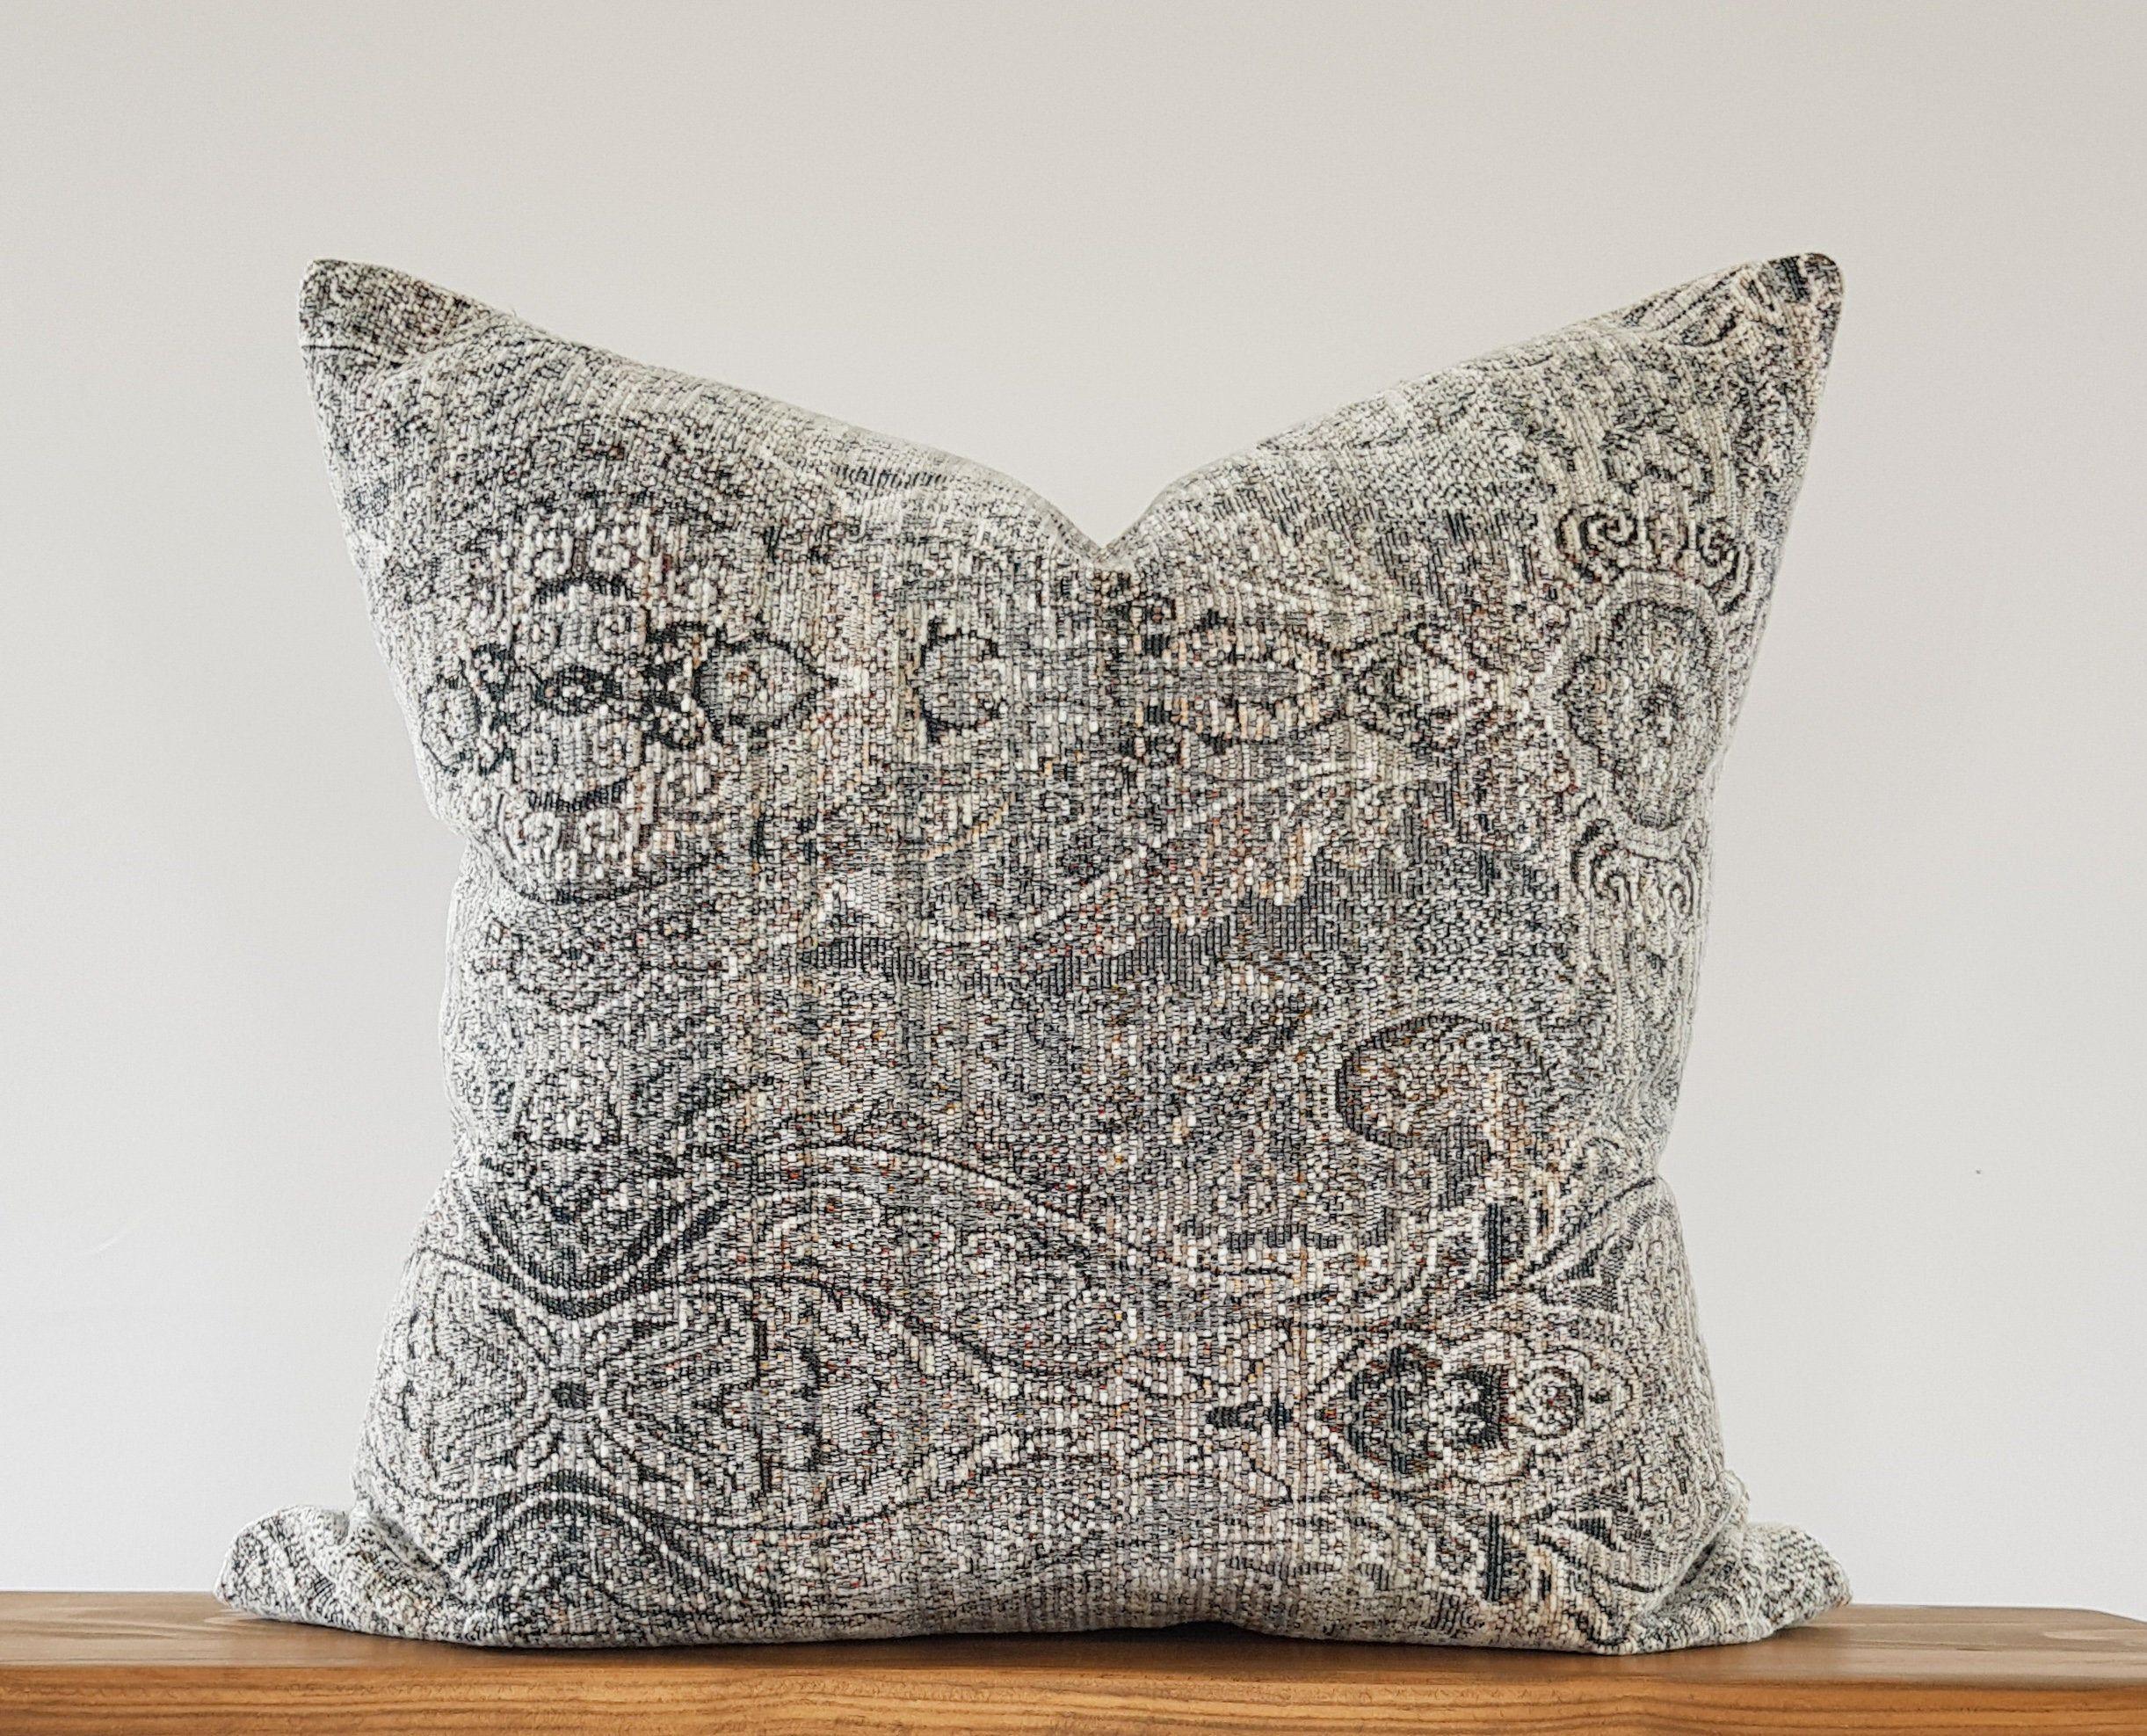 turkish pattern cushion cover 20x20